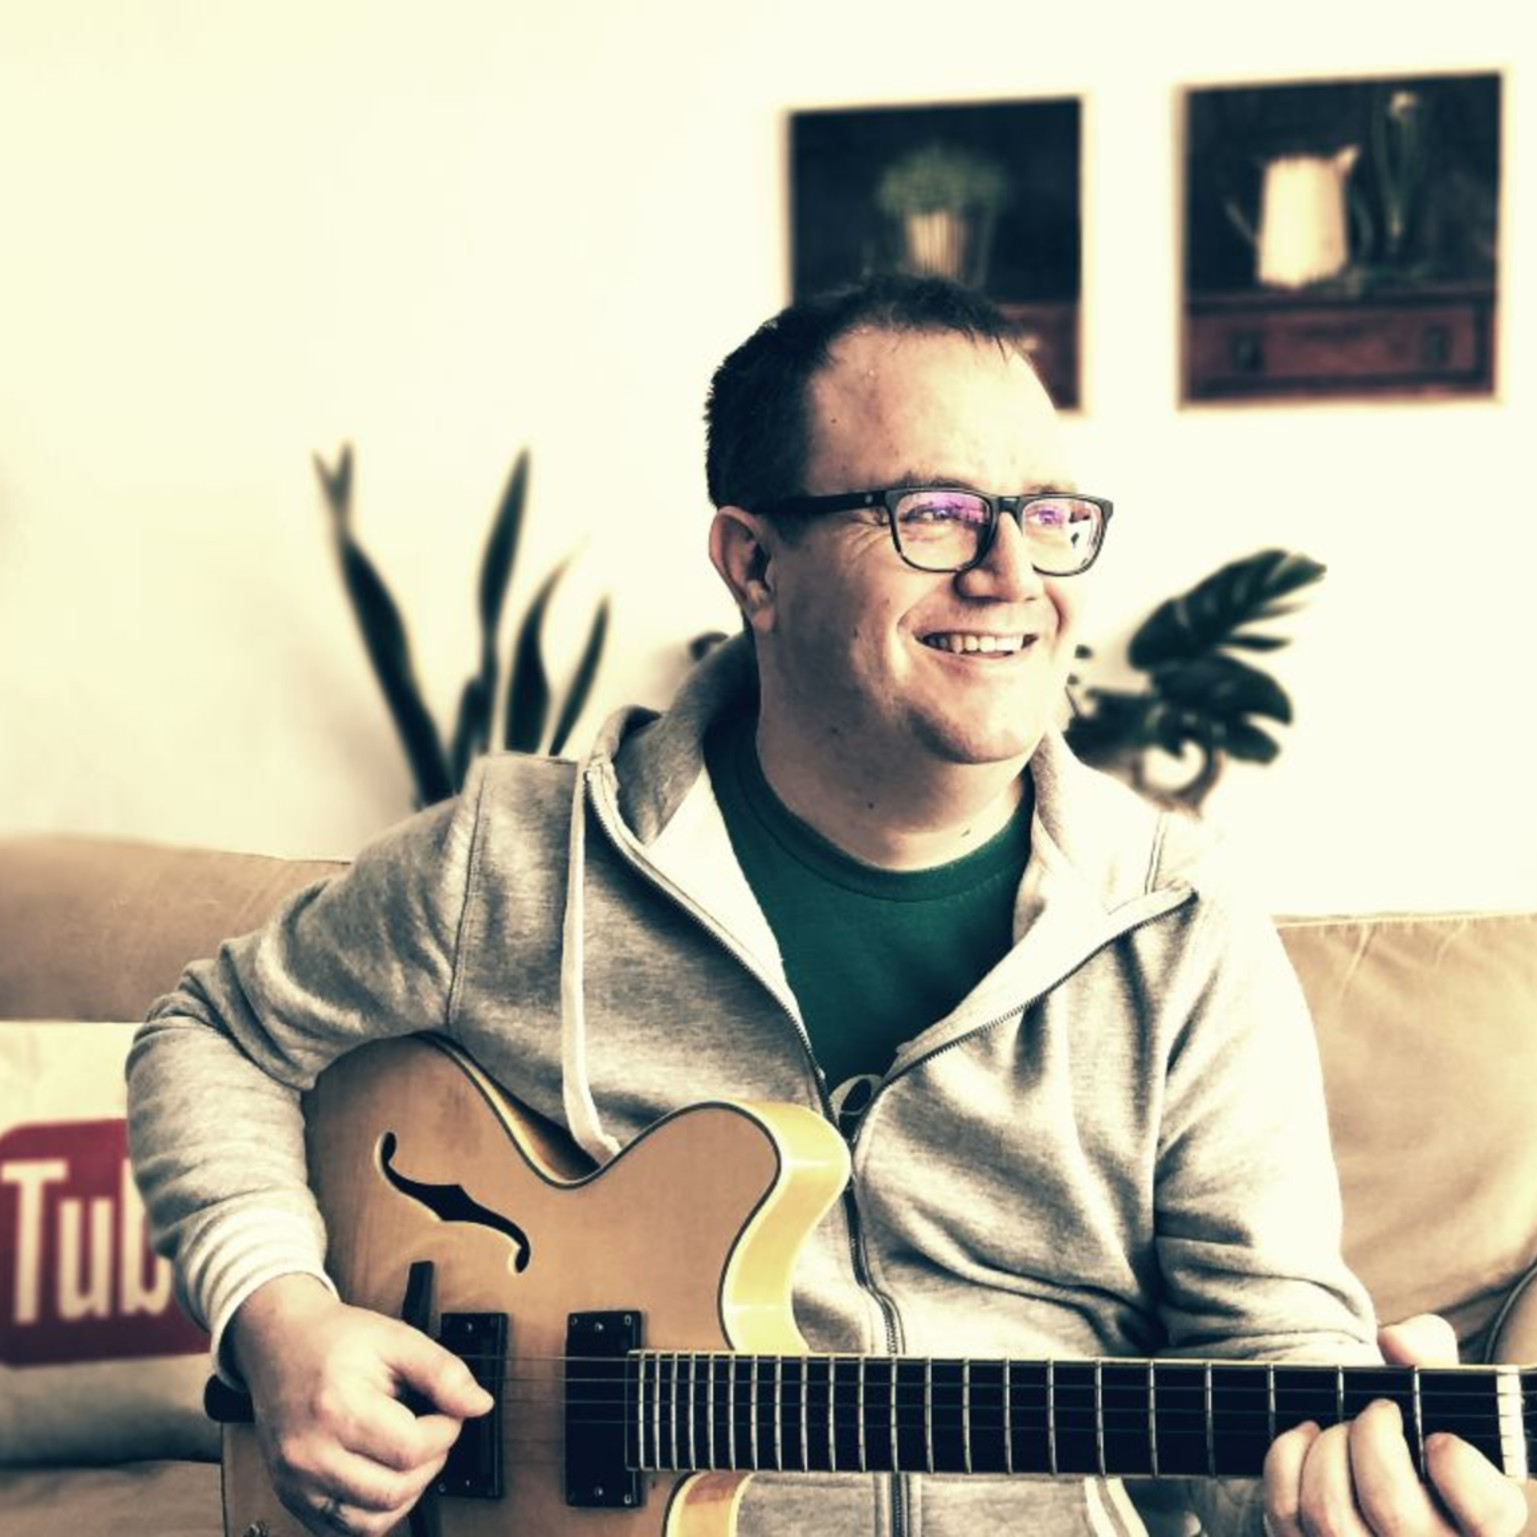 maurice hissink music-mindset.com profile image